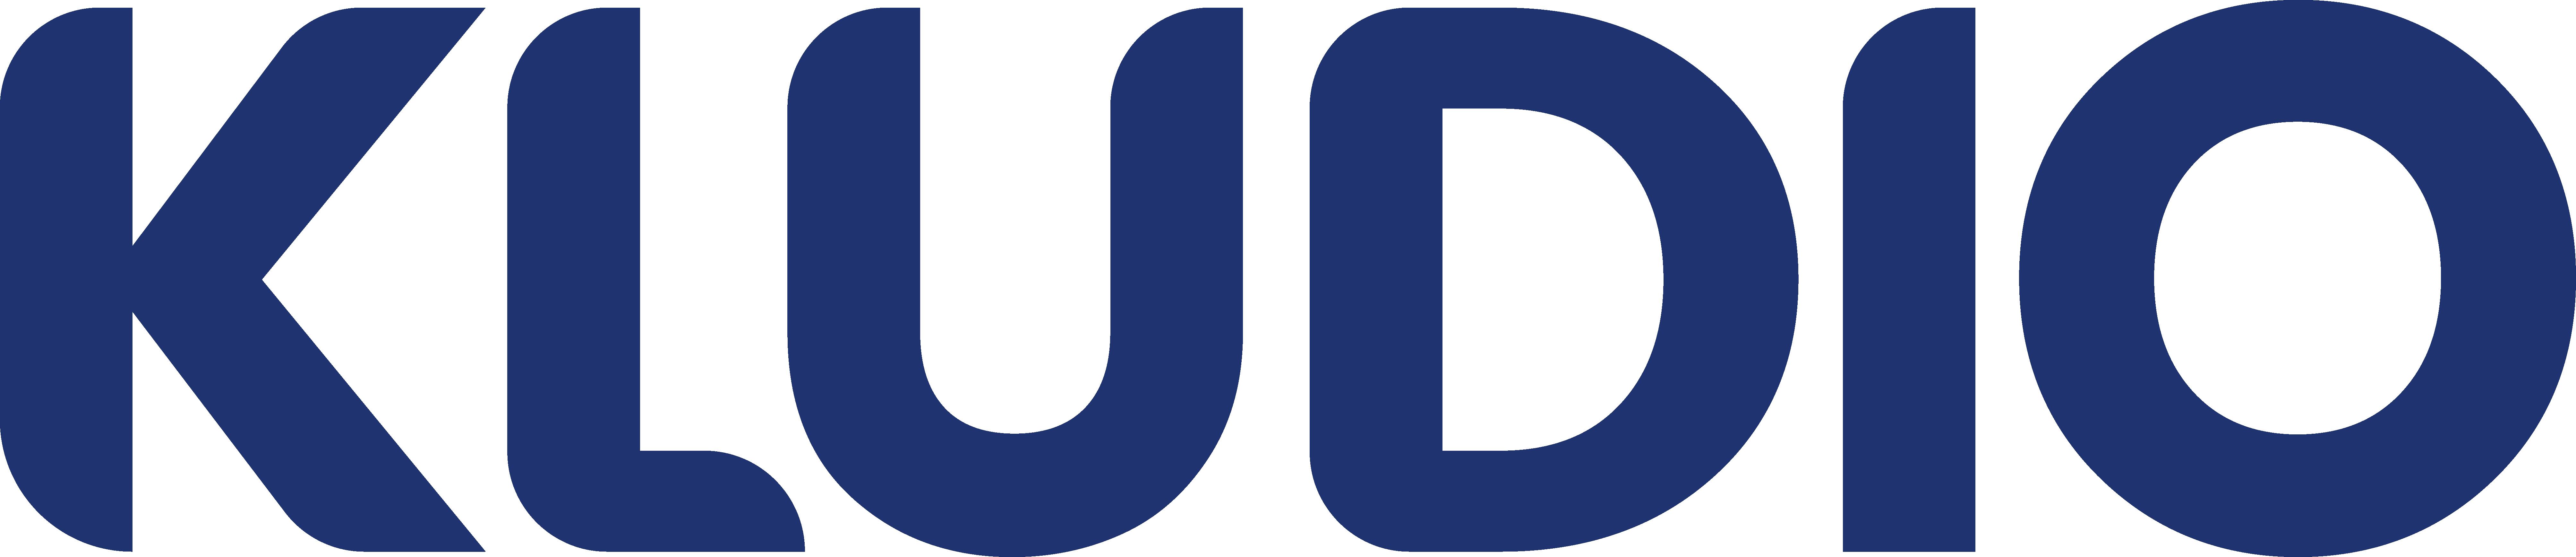 kludio_logo_name